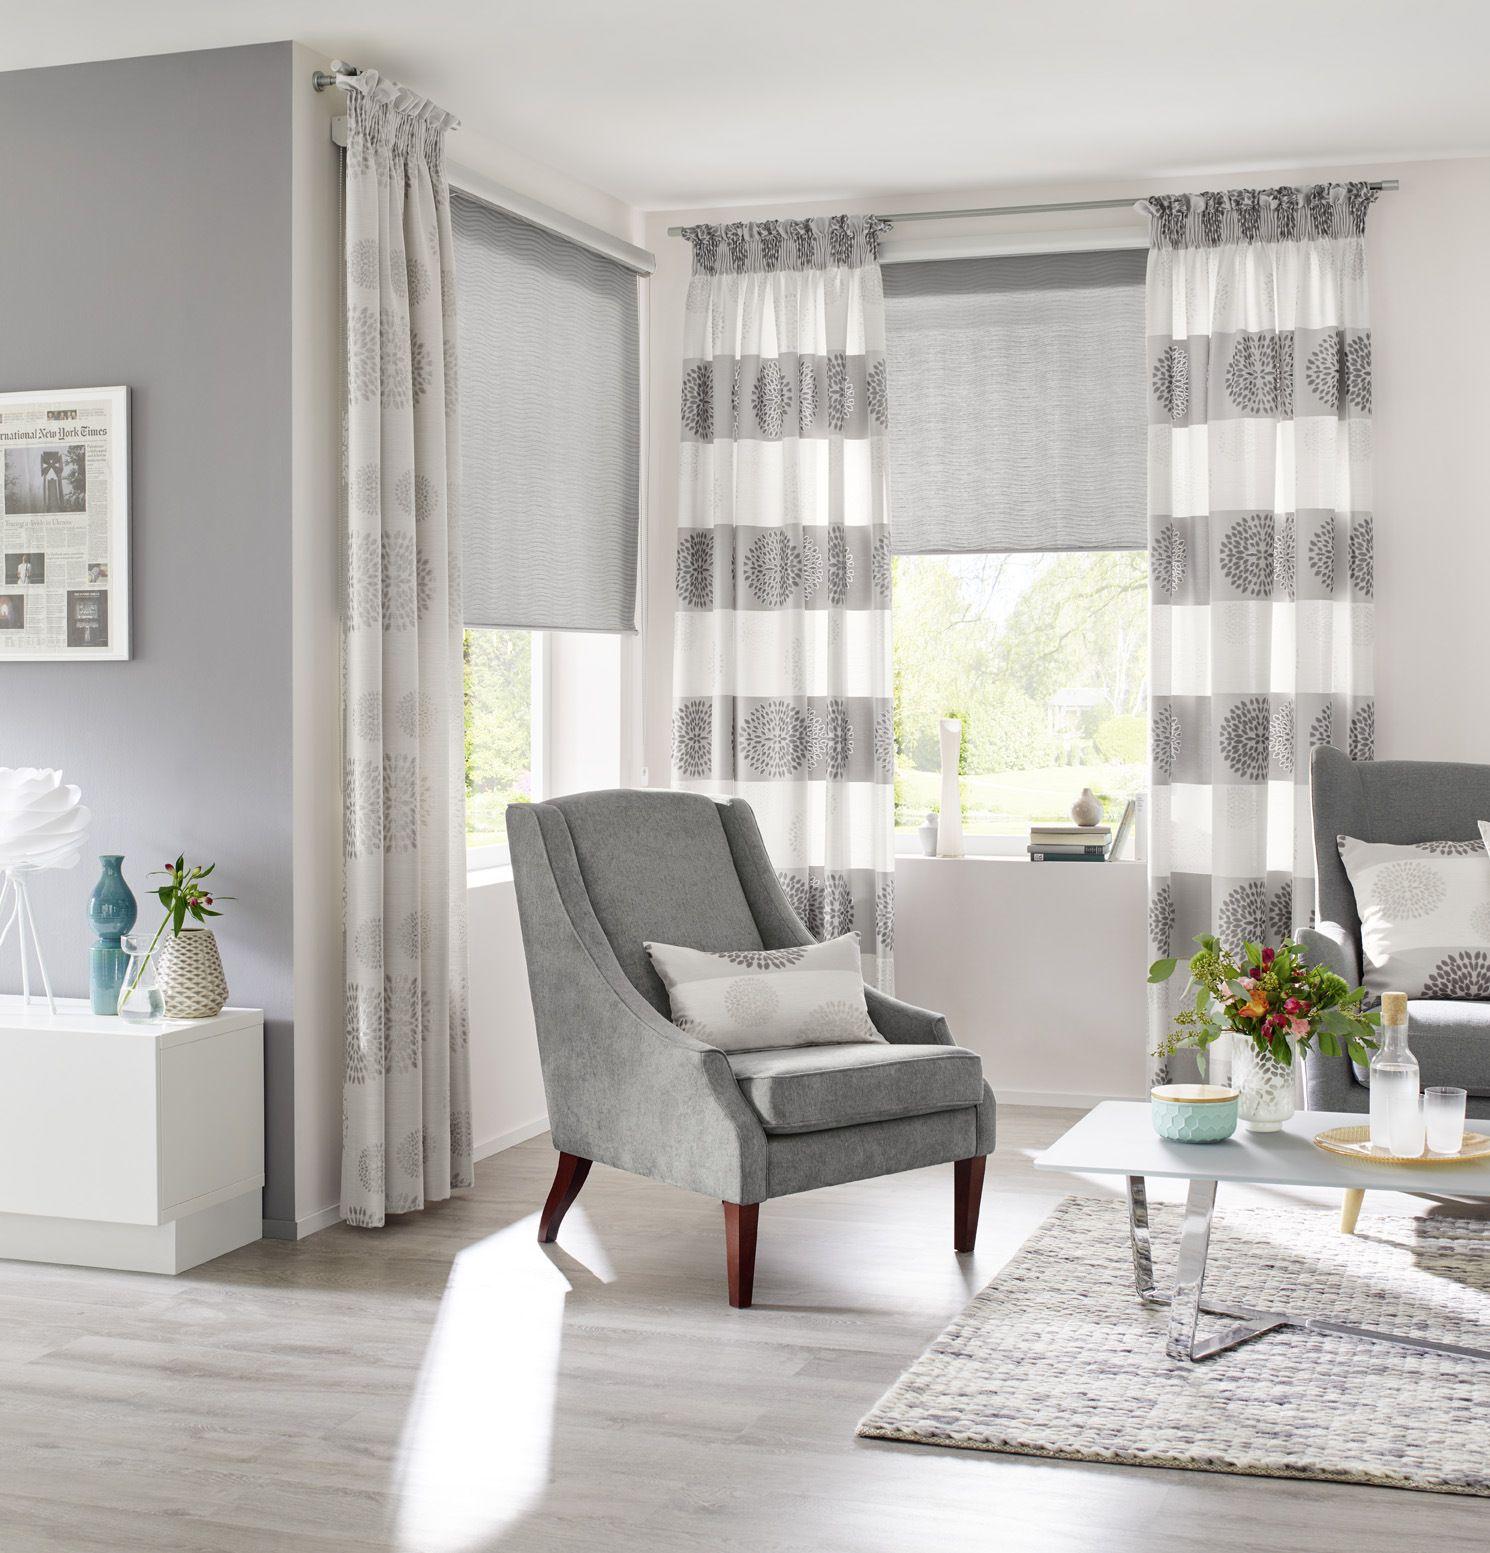 fenster globe gardinen dekostoffe vorhang wohnstoffe plissees rollos jalousien. Black Bedroom Furniture Sets. Home Design Ideas